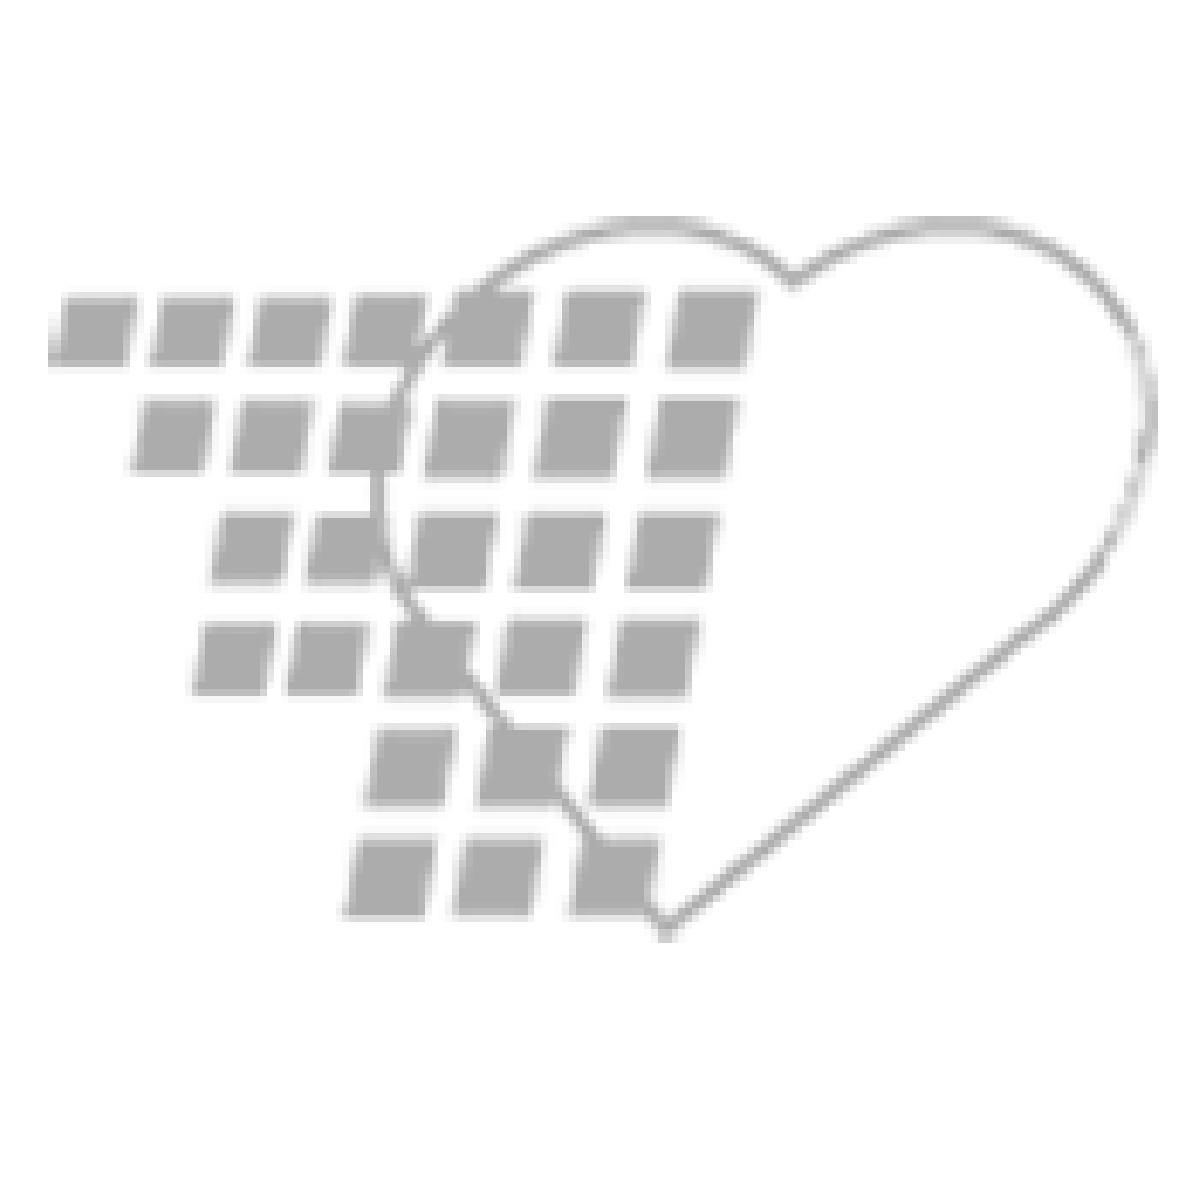 02-92-3310 Infant Measuring Tape